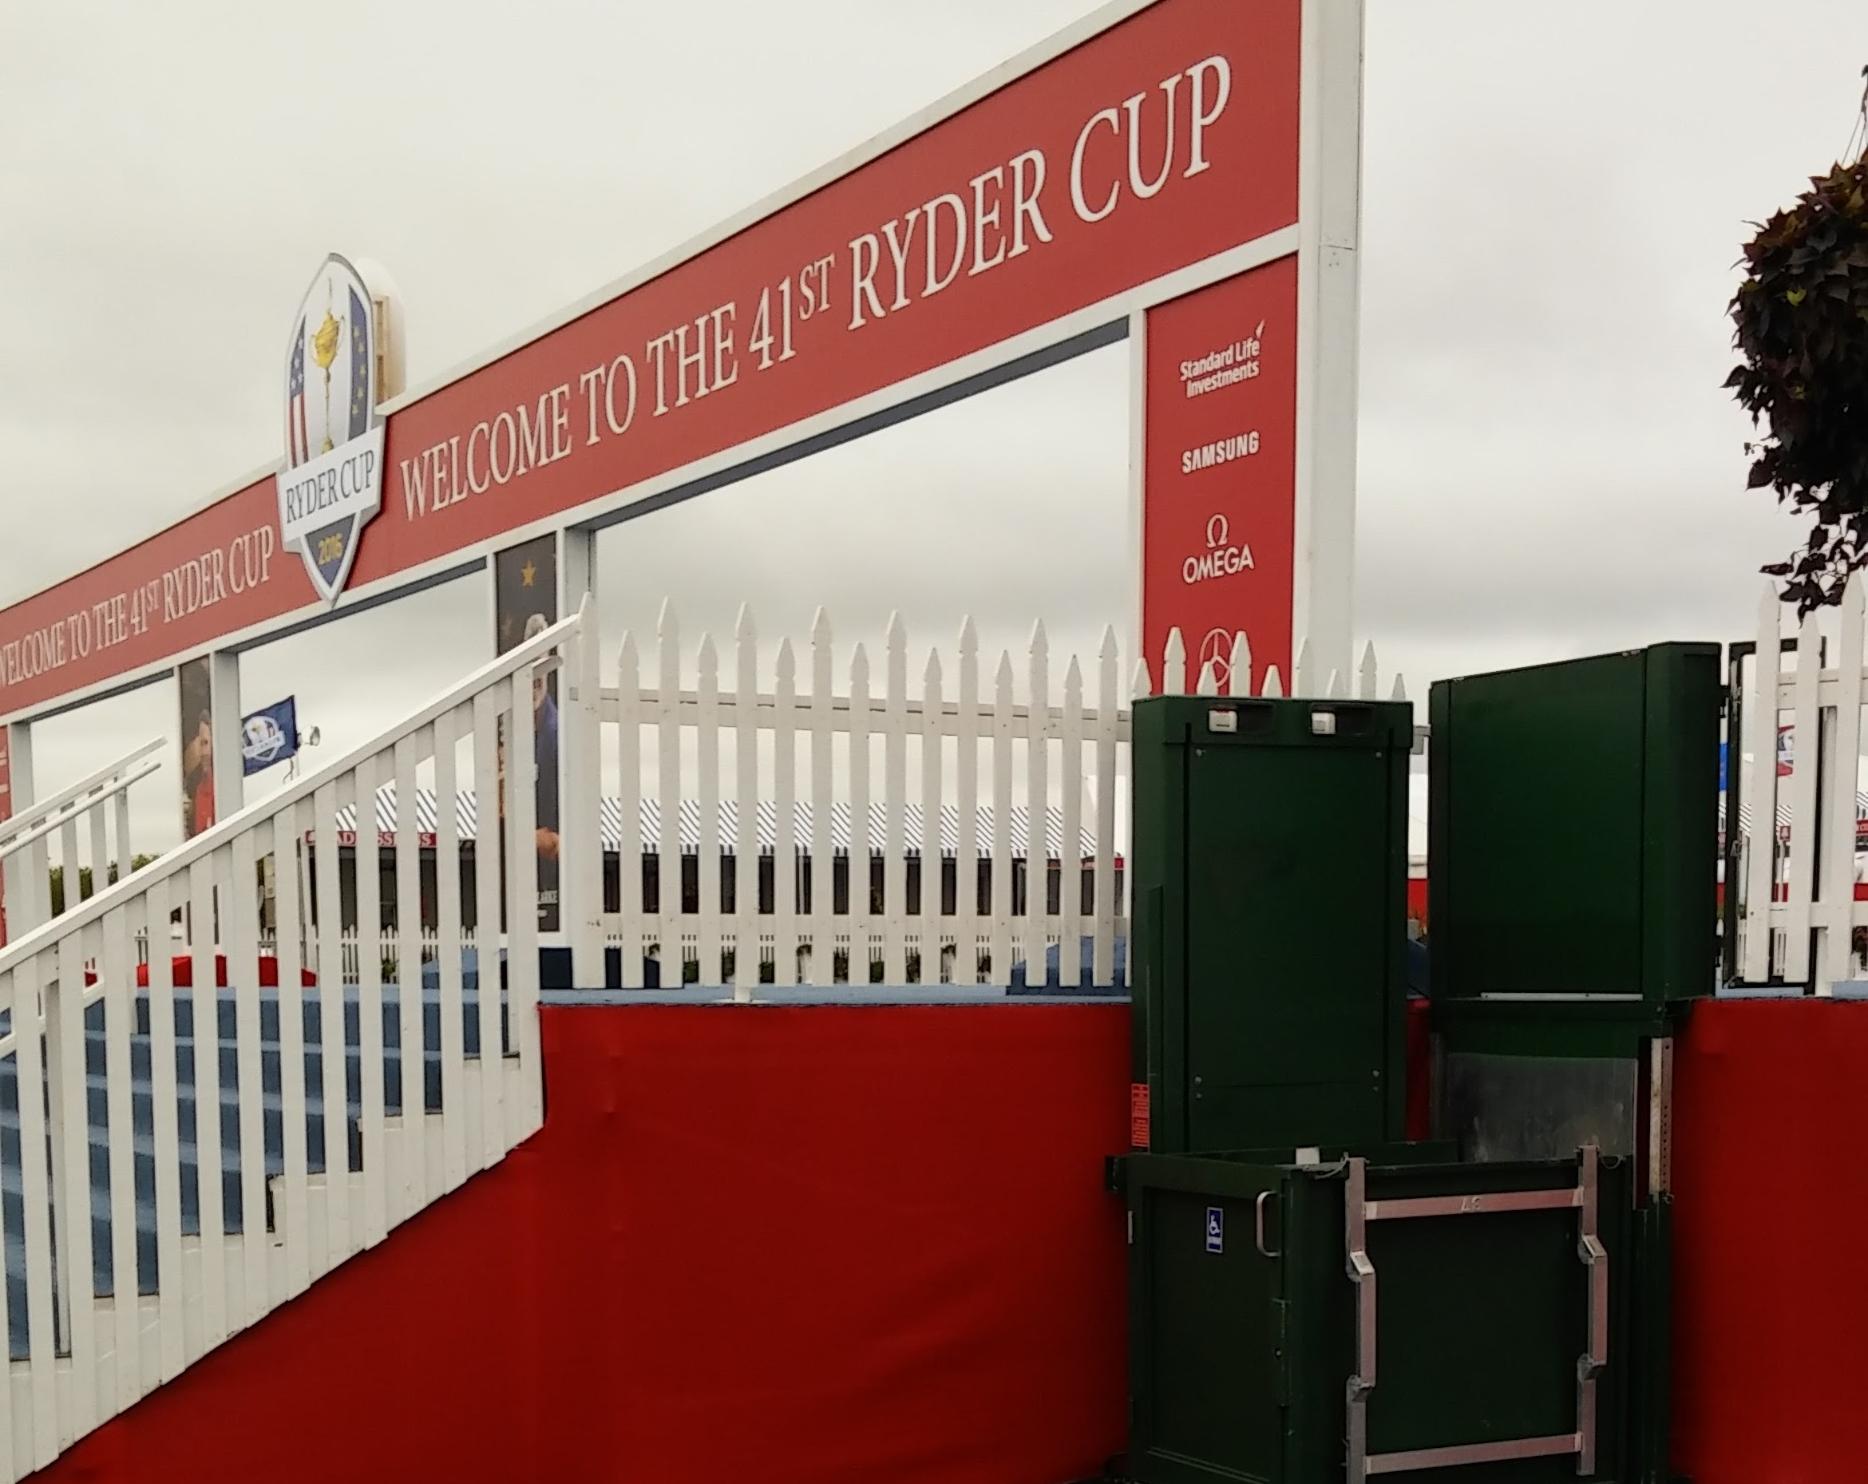 https://adaliftrentals.com/wp-content/uploads/2021/03/Ryder-Cup-Lift-2.jpg